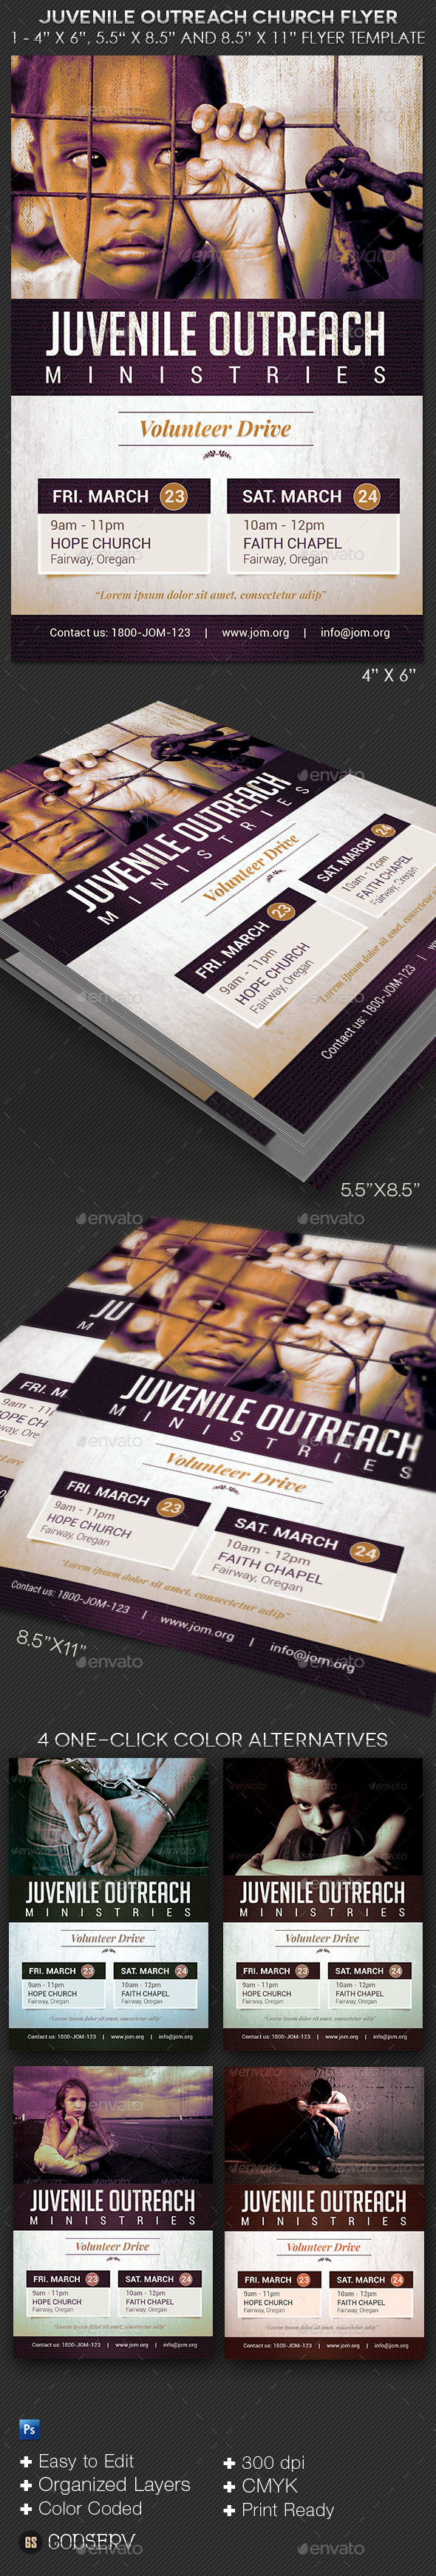 Juvenile Outreach Church Flyer Template - Church Flyers